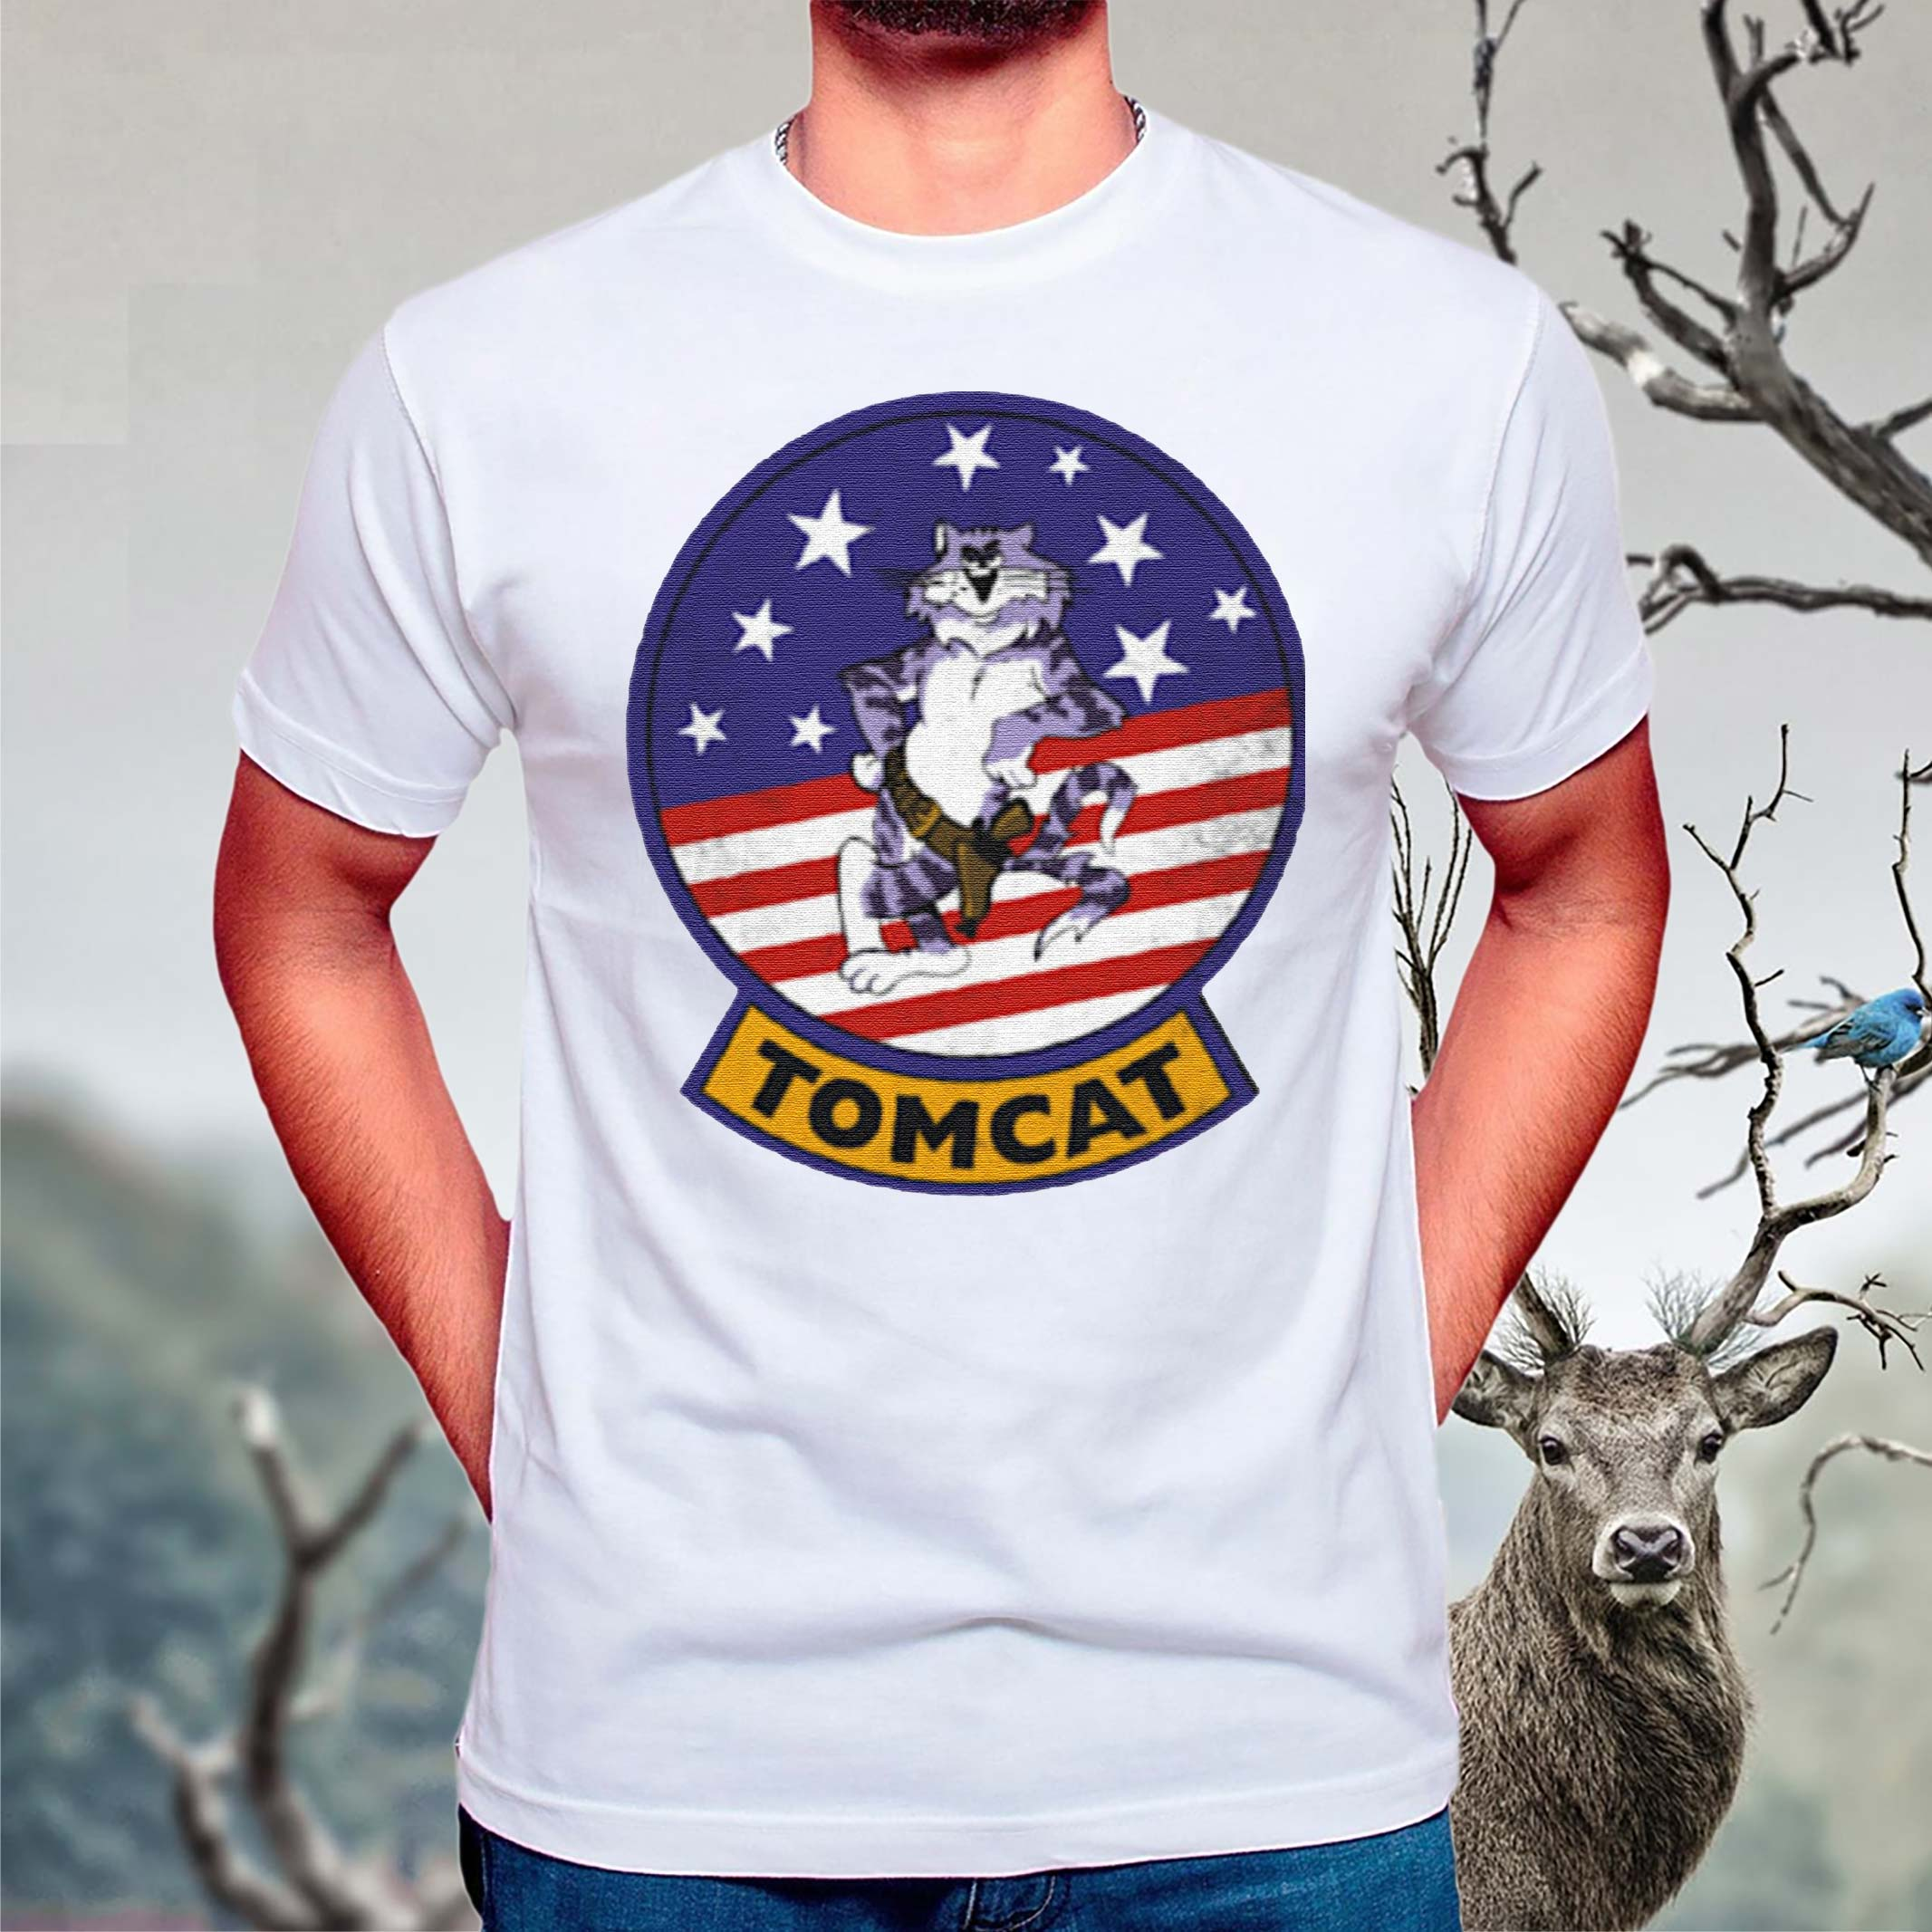 Tomcat-Top-Gun-TShirts